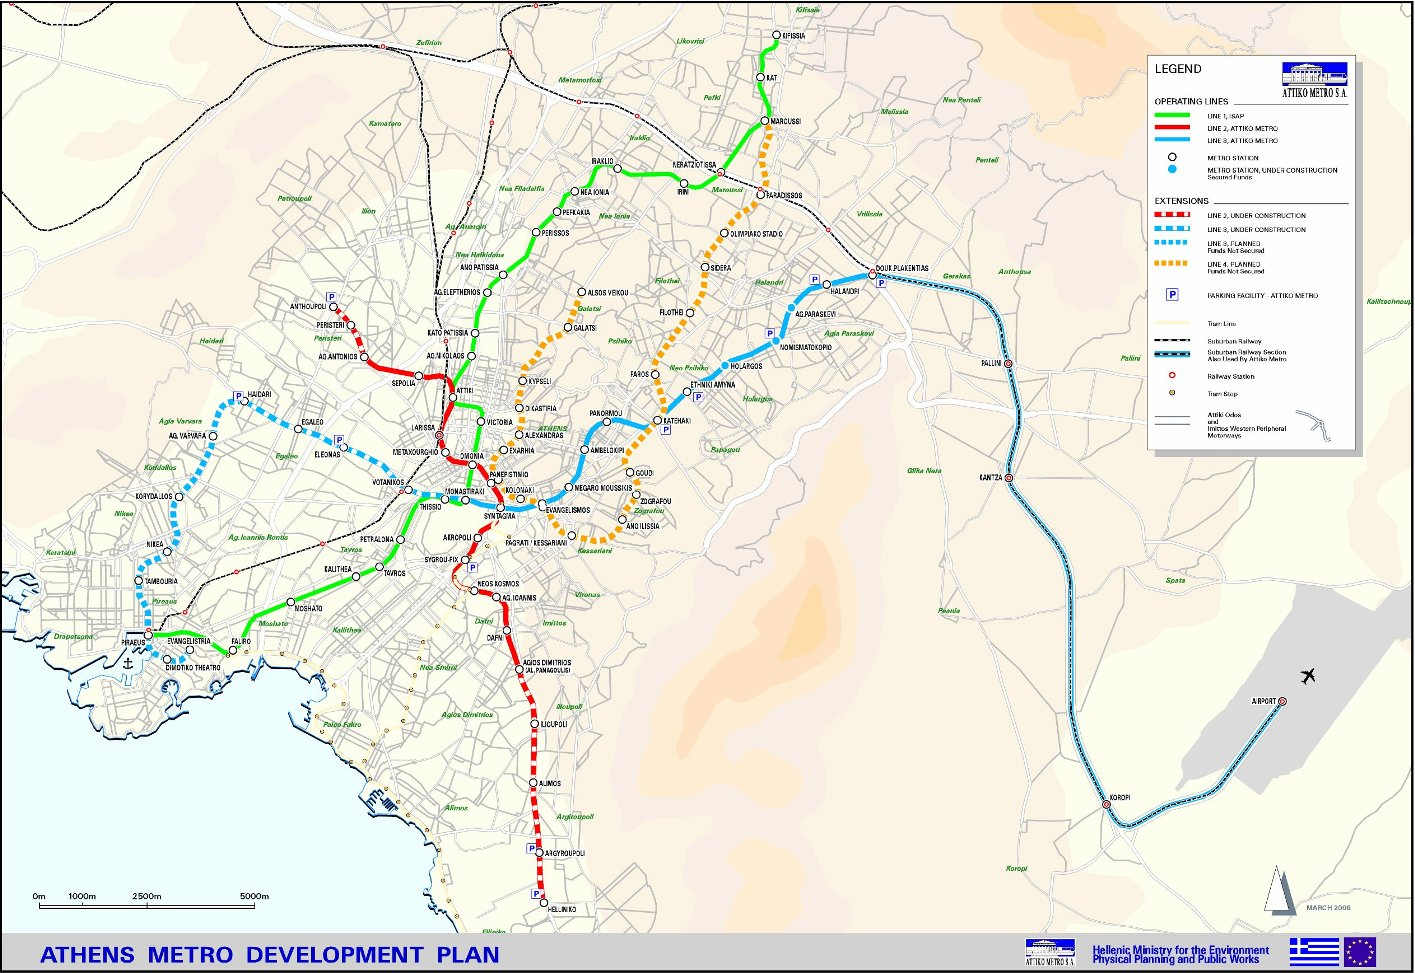 Схема метро в Афинах